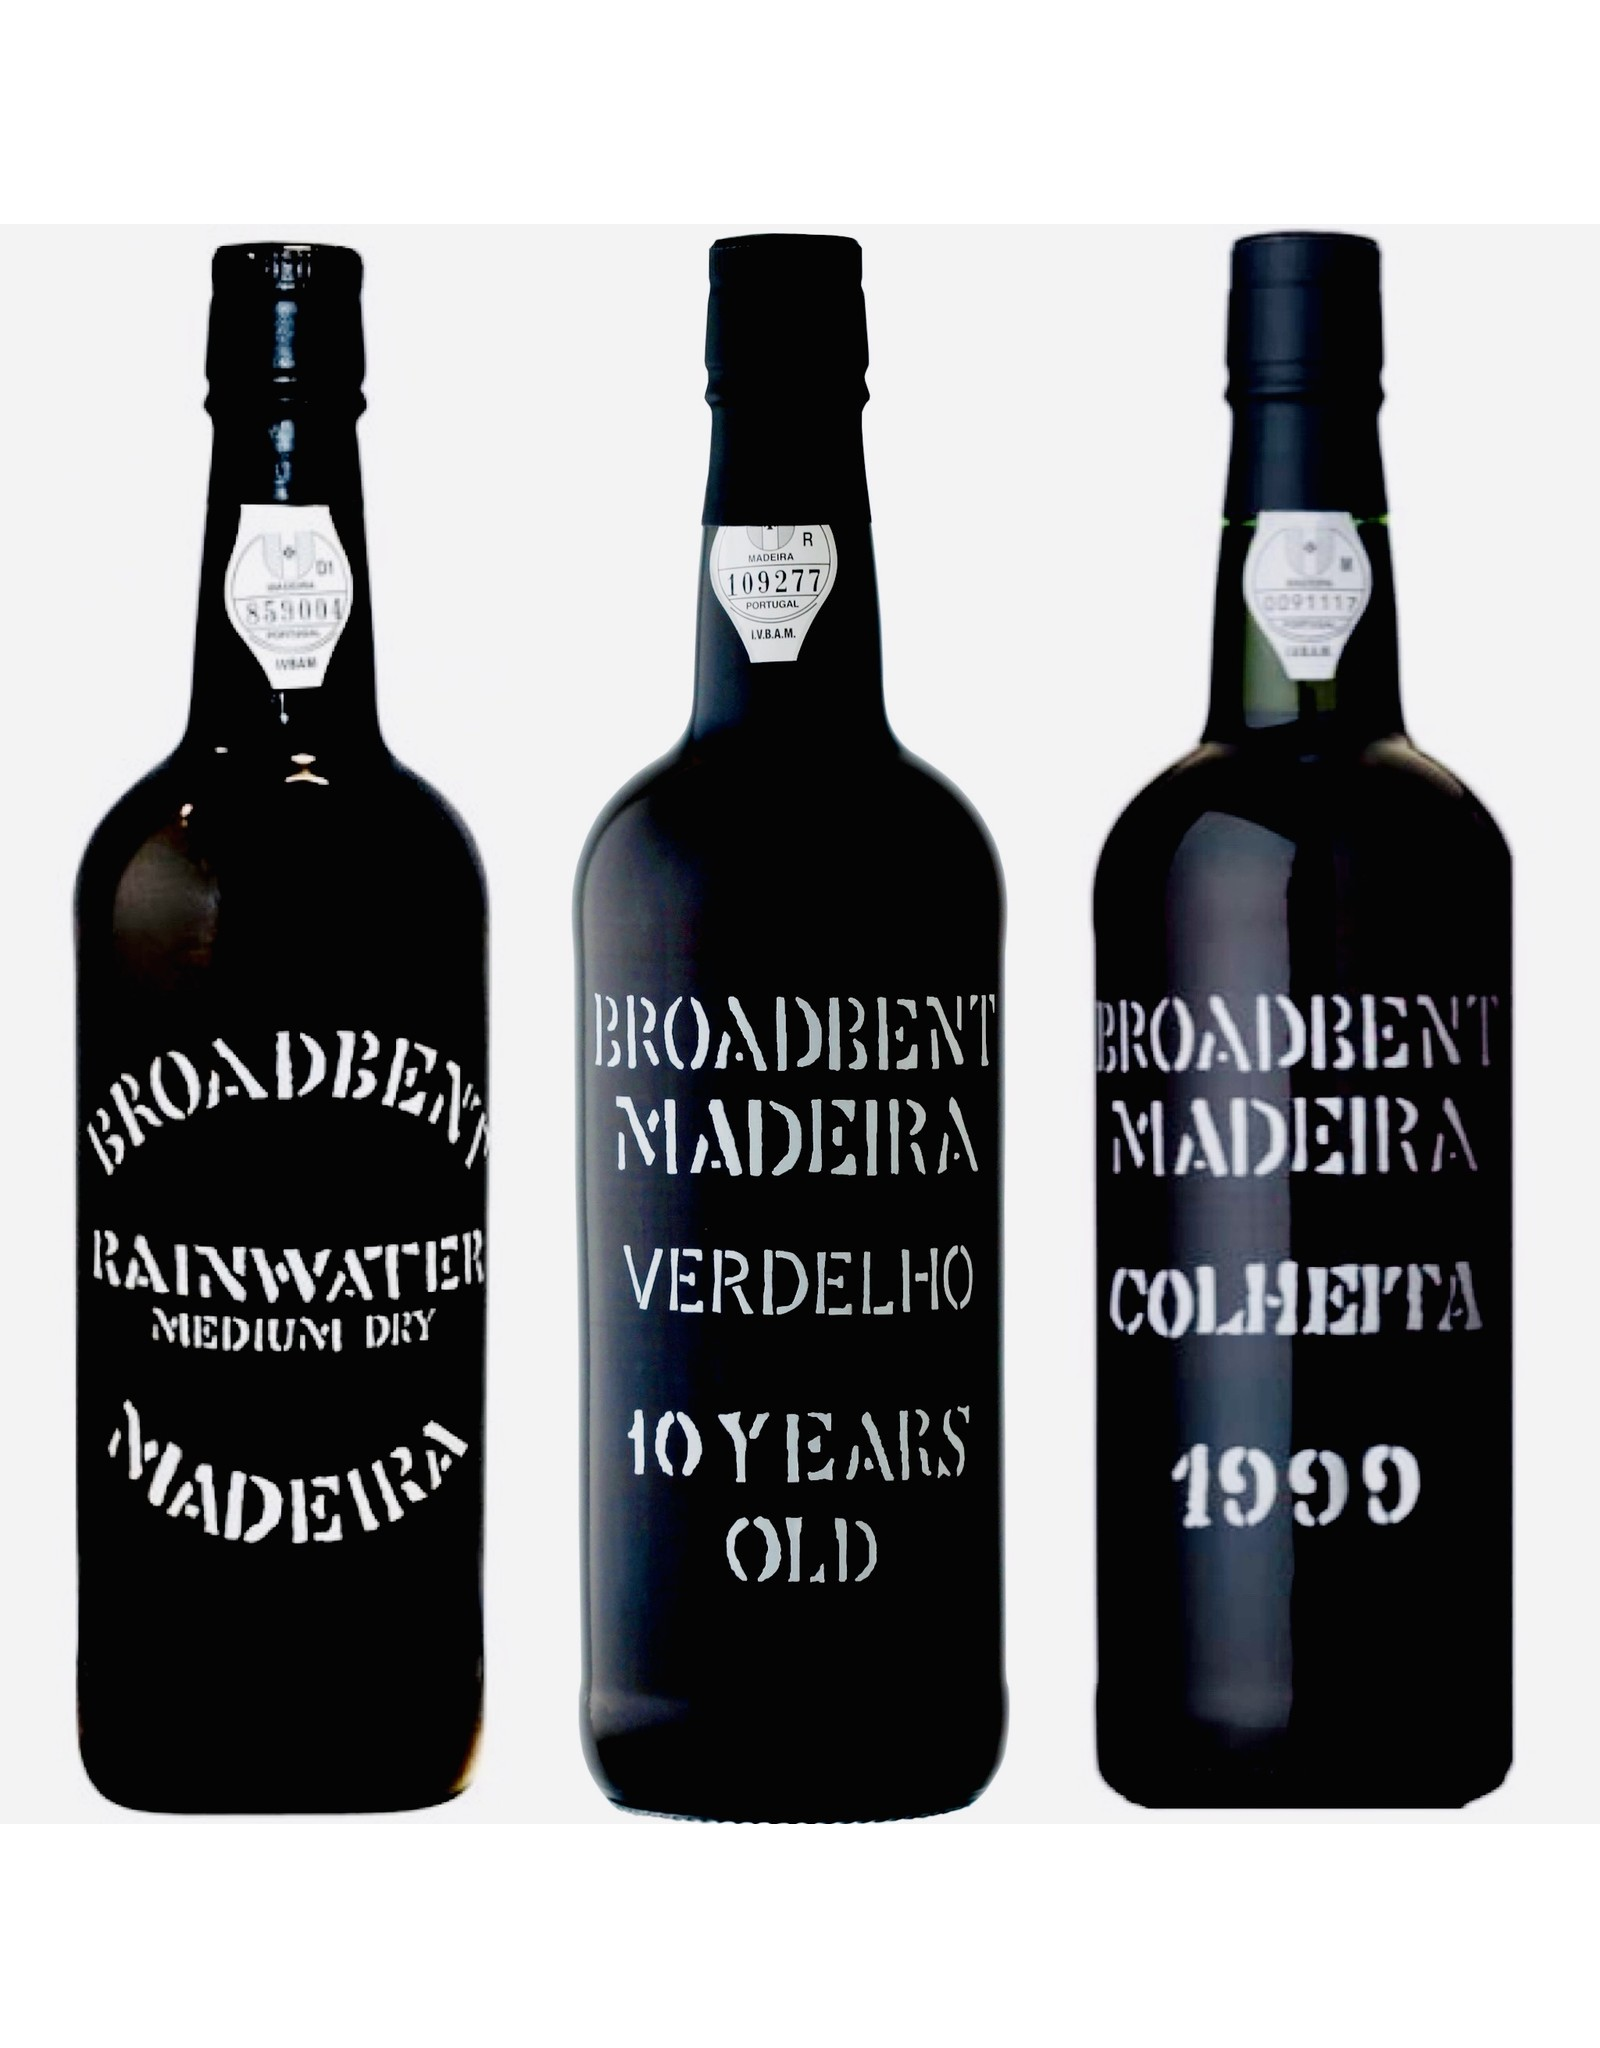 December 4th BRIX at 6:00 Trio—Holiday Madeira Tasting